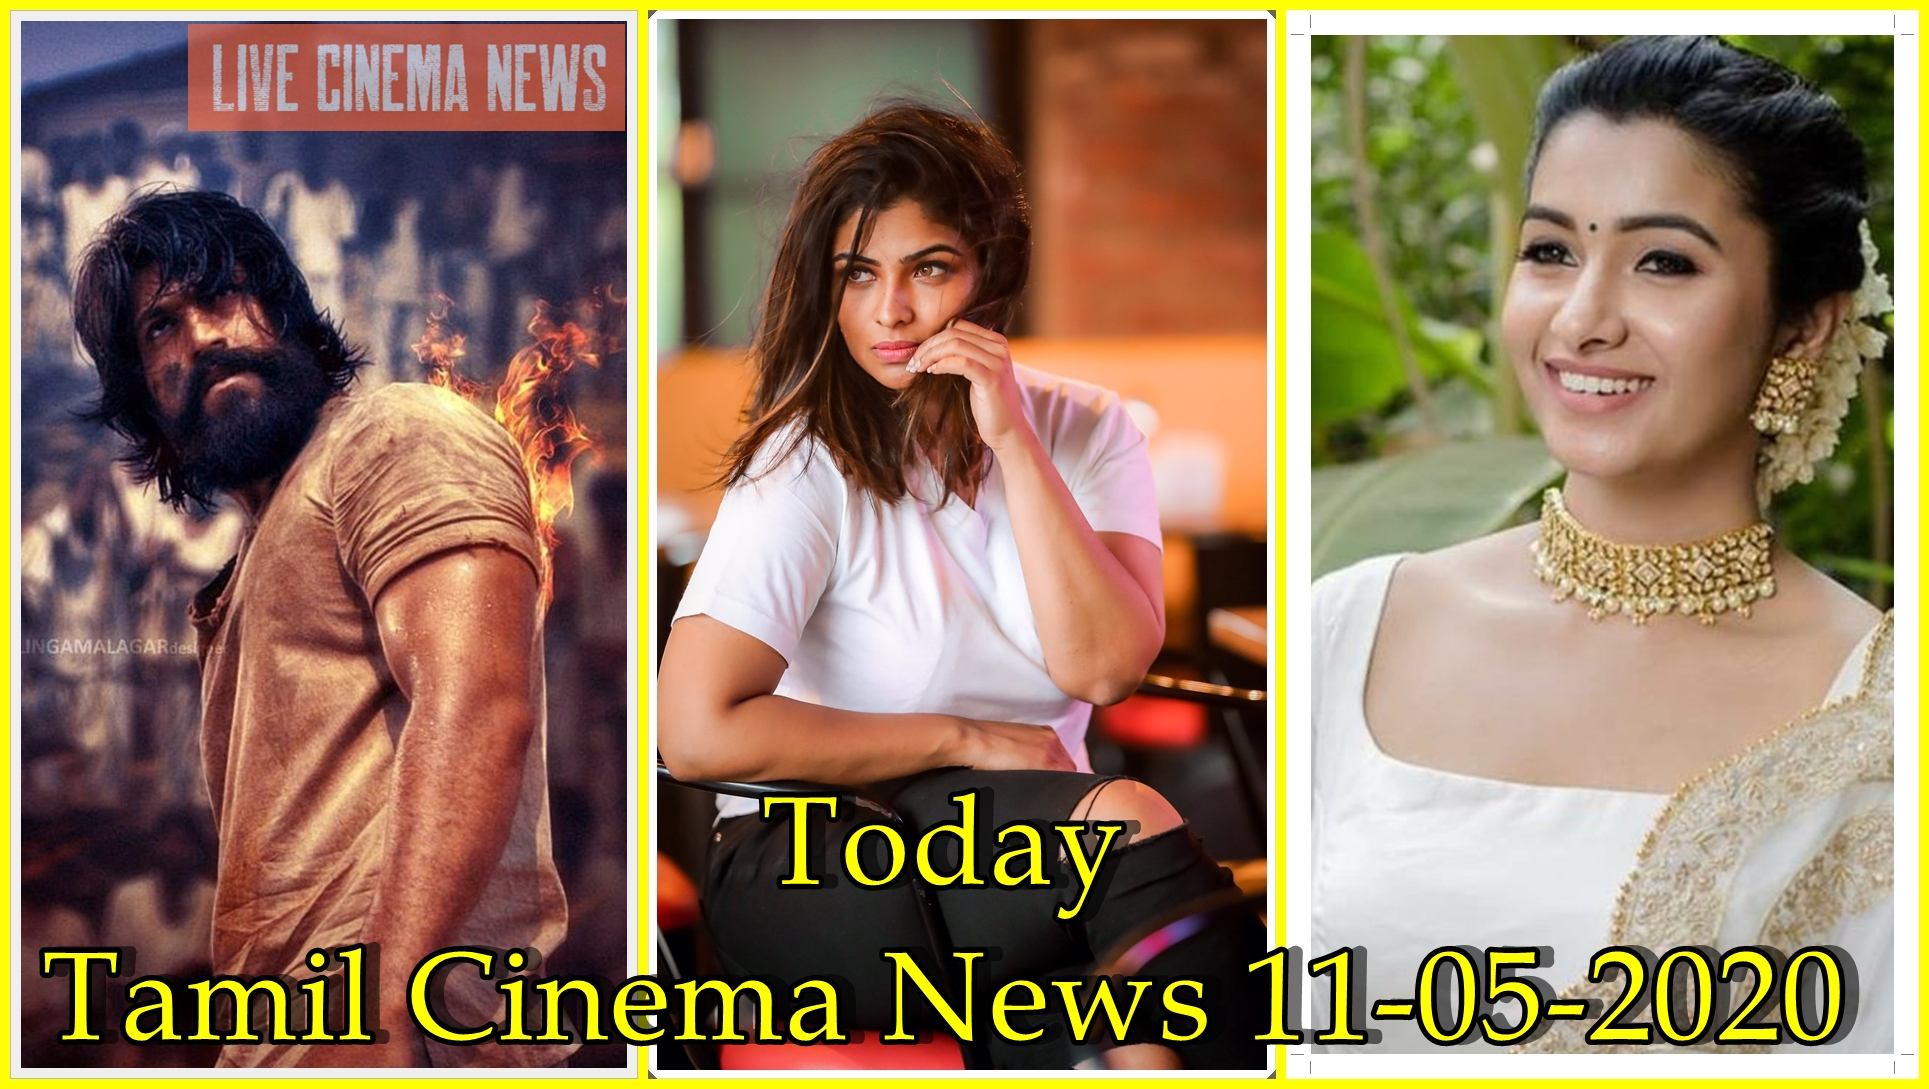 Tamil Cinema News 11-05-2020